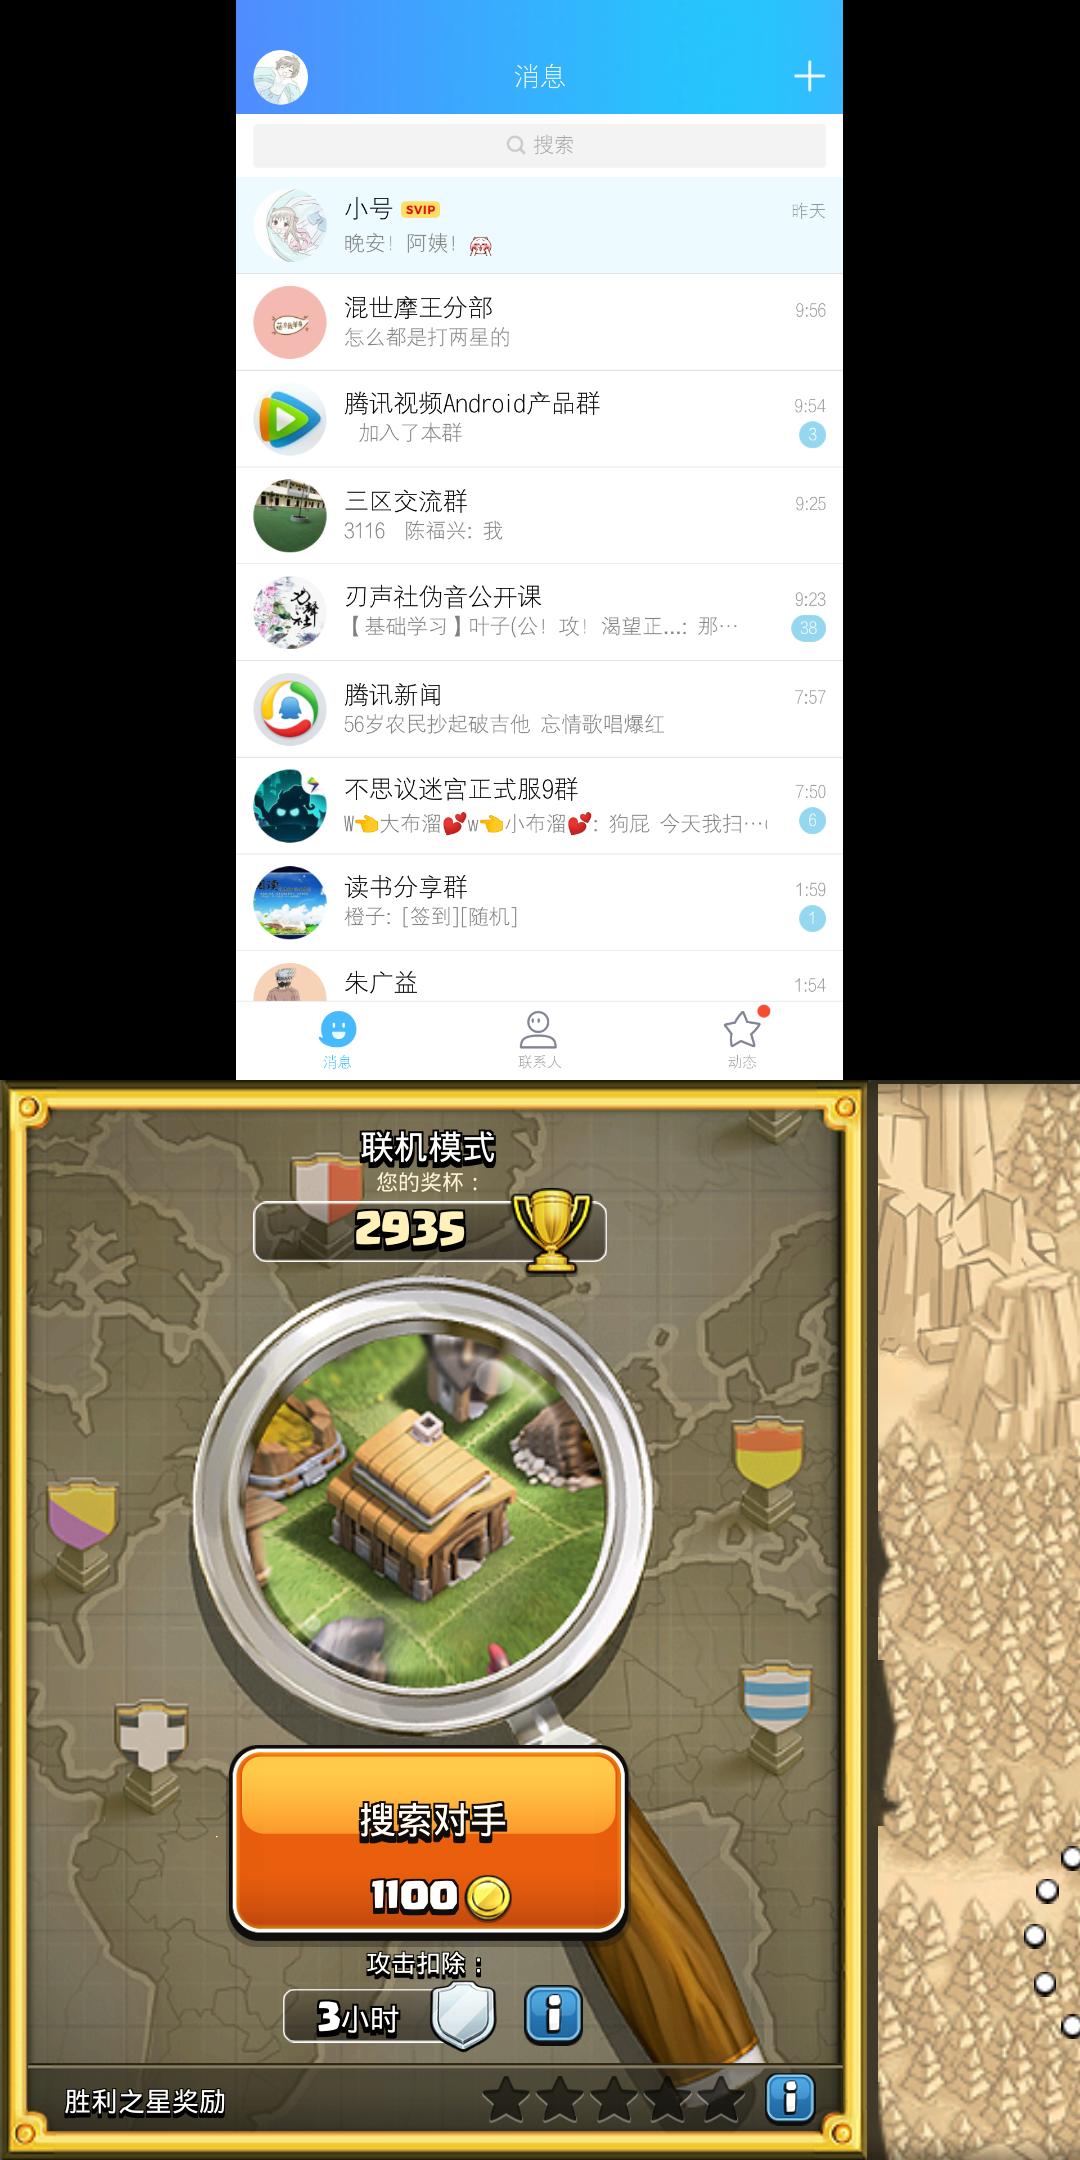 Screenshot_2018-12-02-09-58-50.png